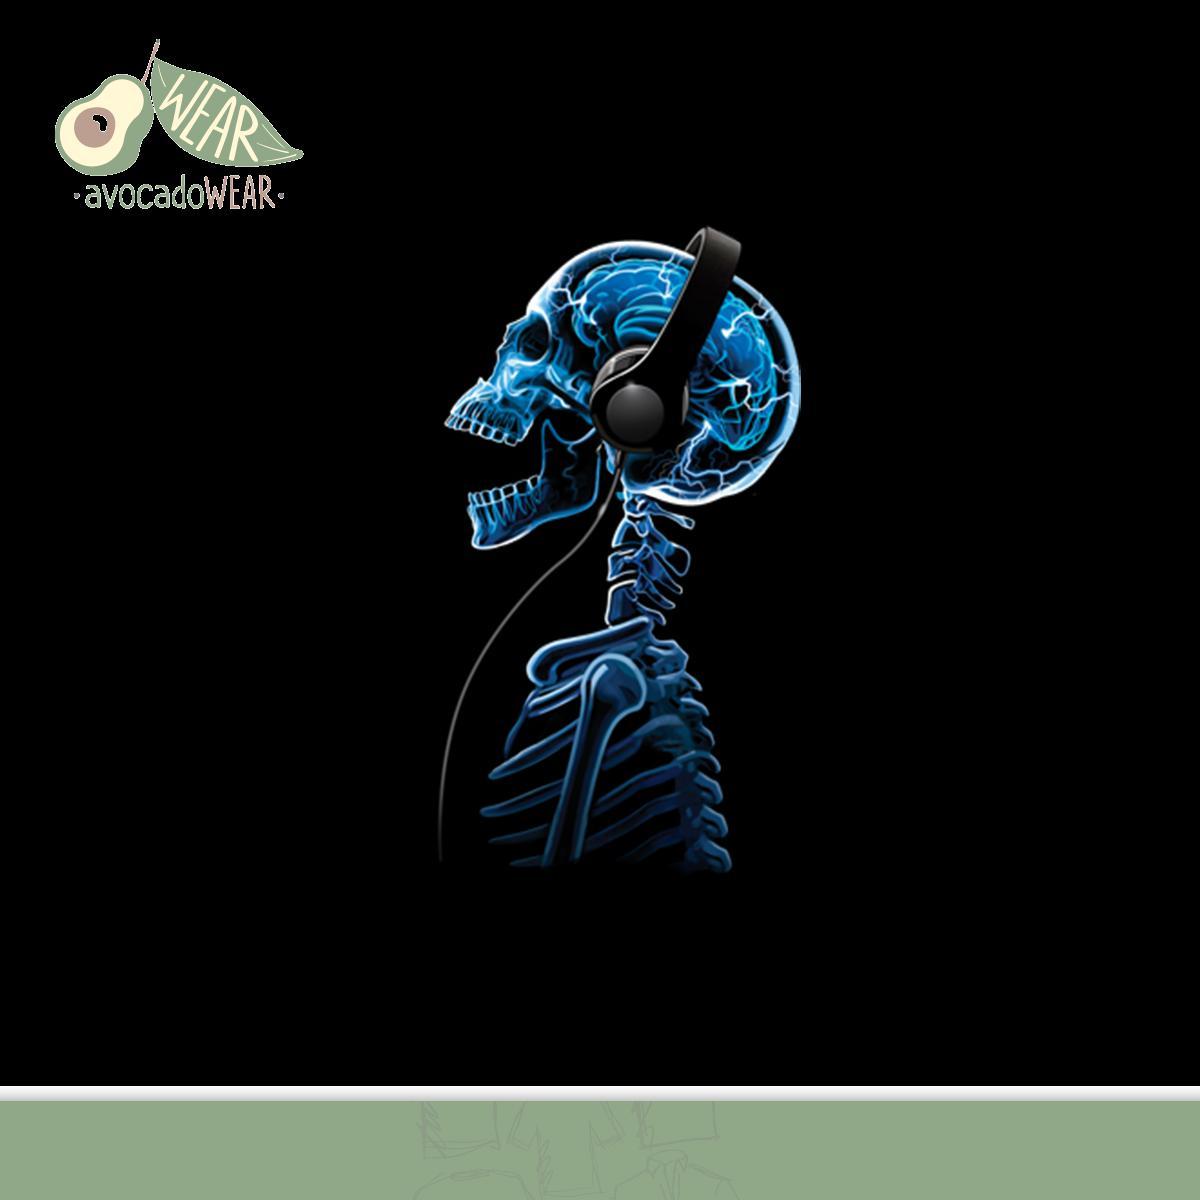 Cuffie-Teschio-Musica-Donna-T-Shirt-S-3XL-Nuovo